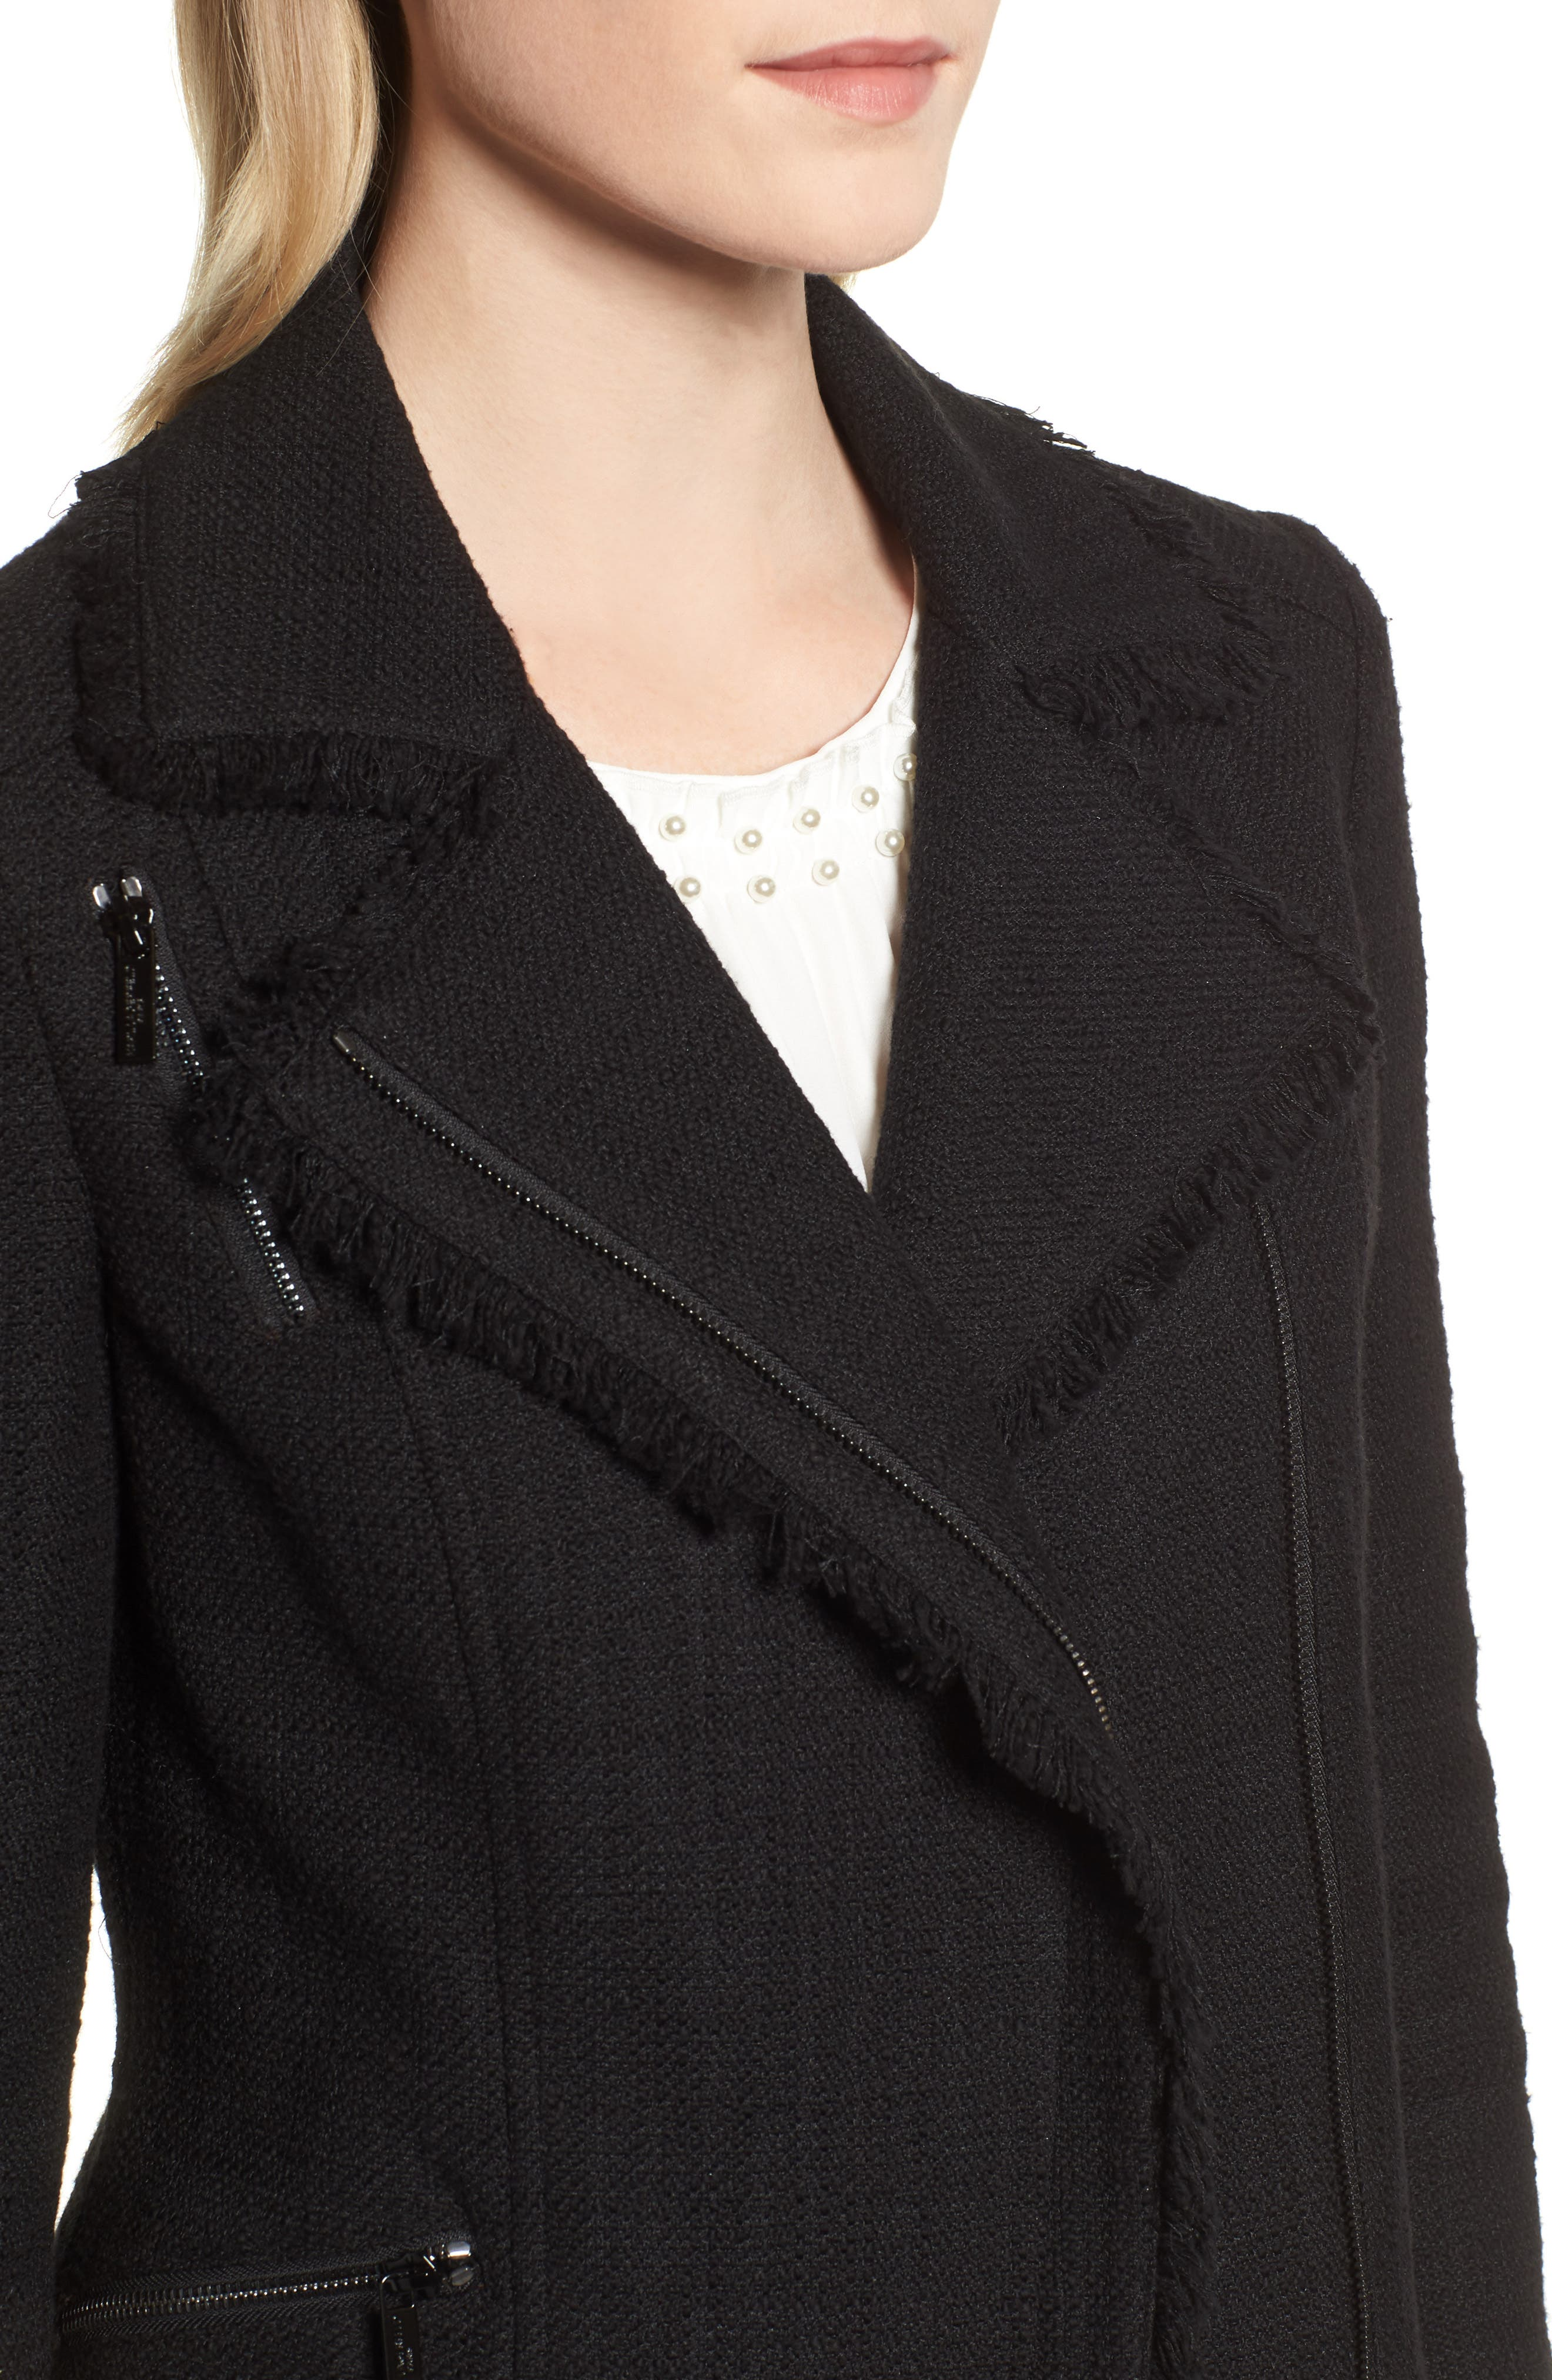 KARL LAGERFELD PARIS,                             Tweed Moto Jacket,                             Alternate thumbnail 5, color,                             001